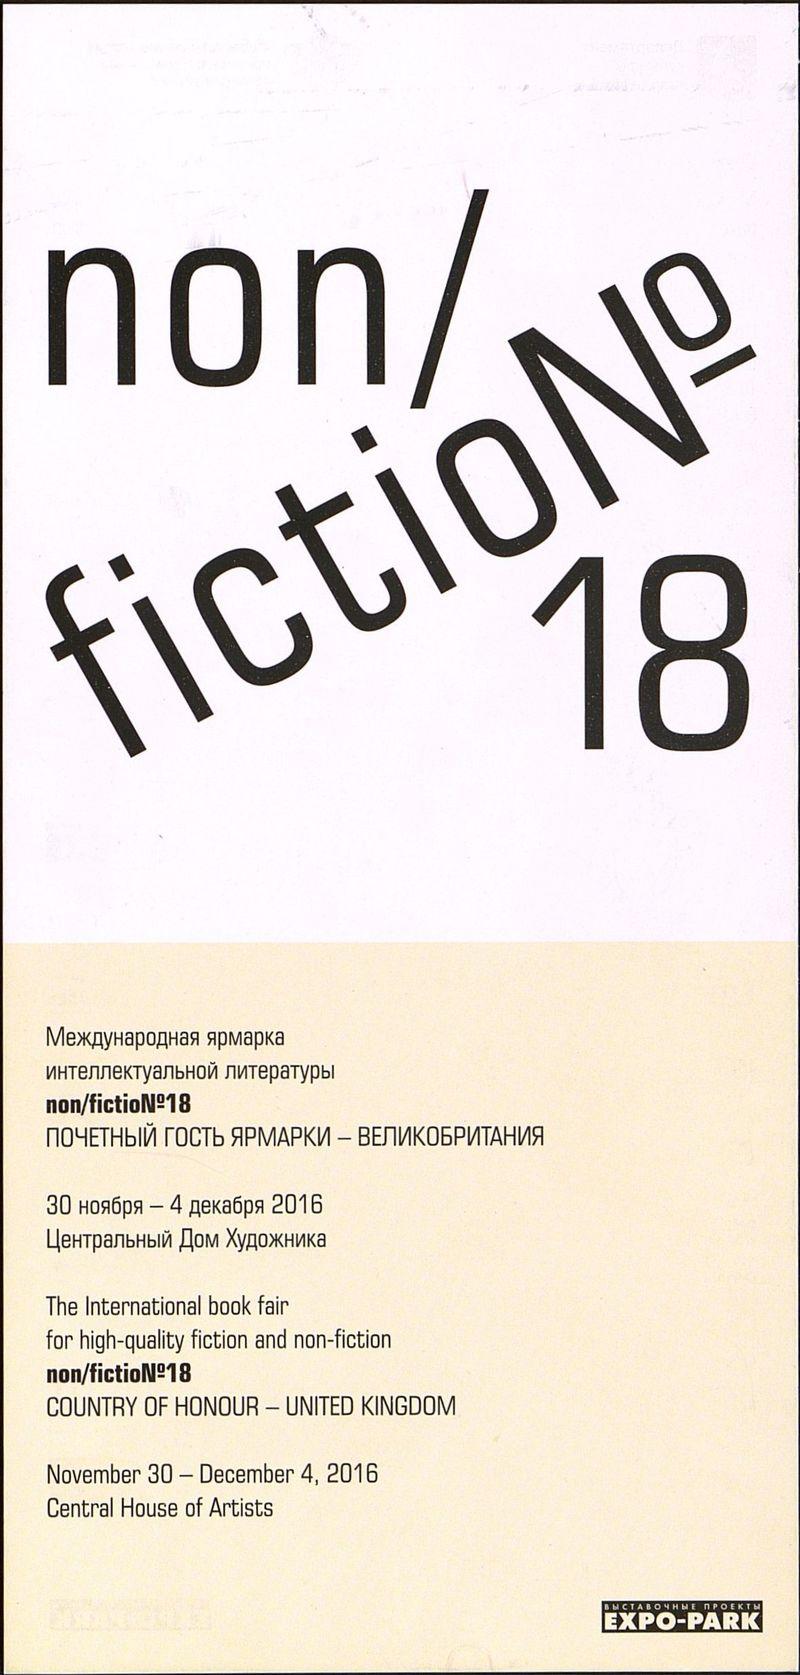 Non/fiction №18